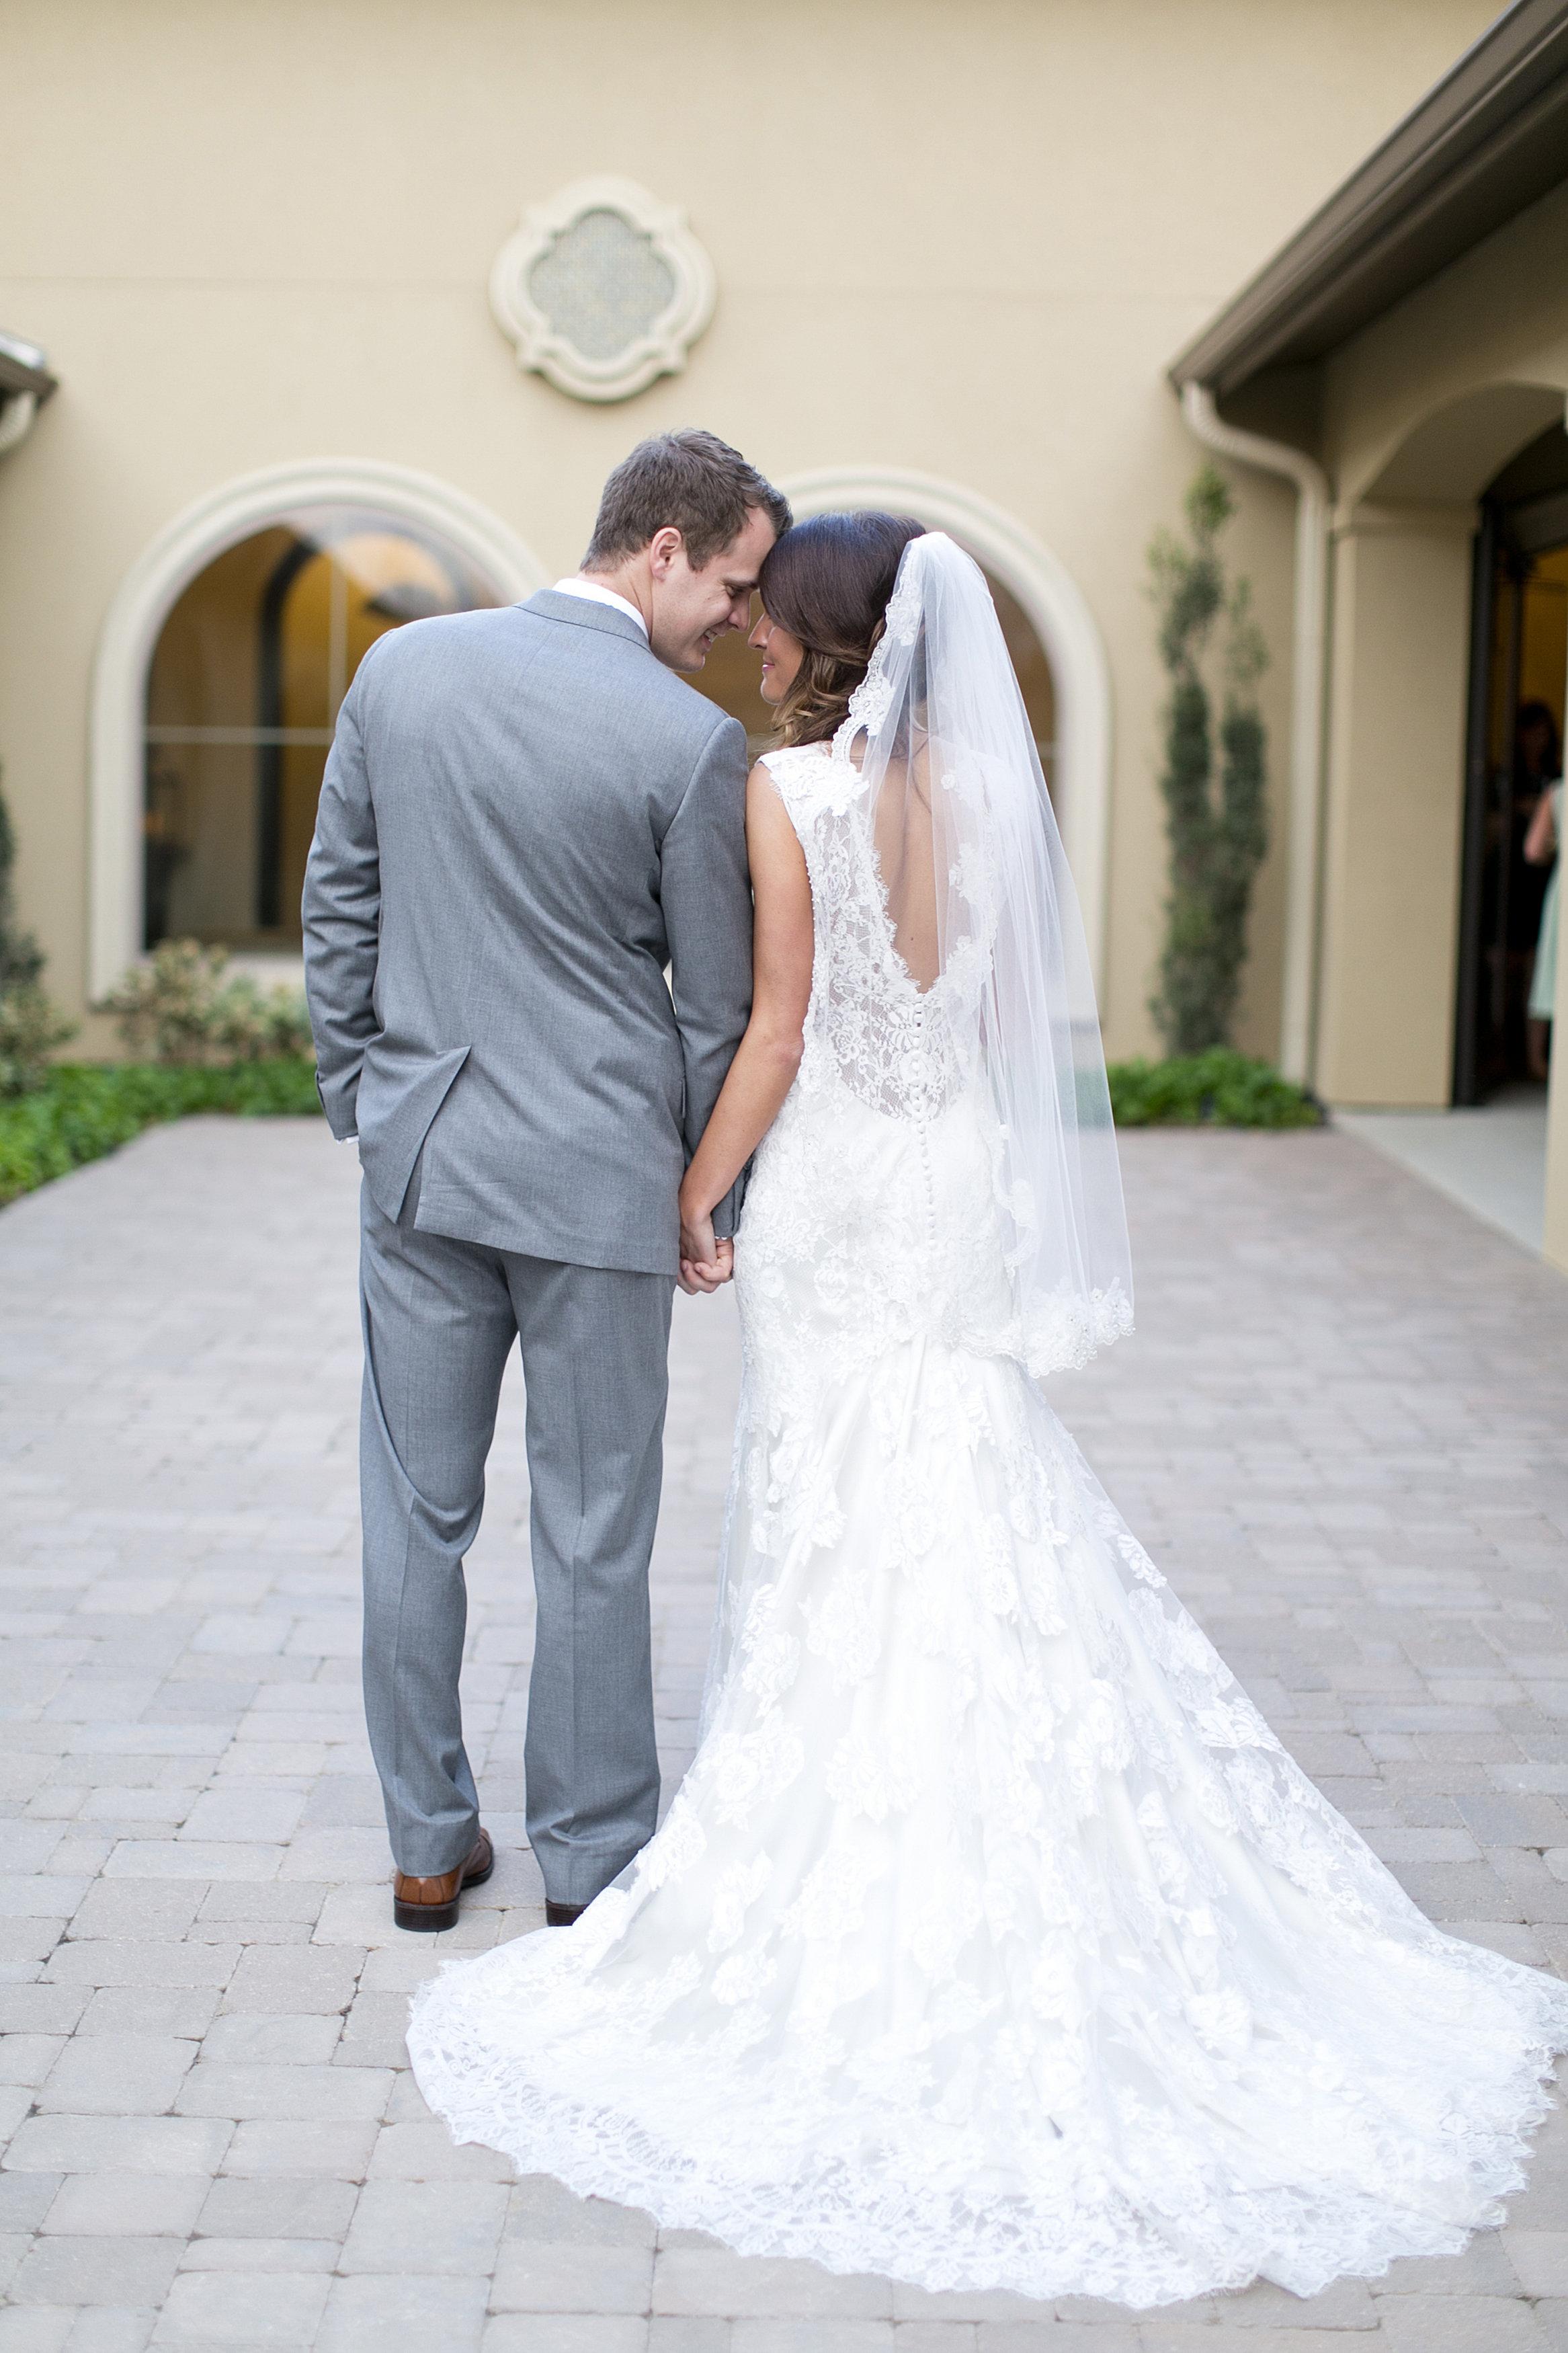 Sims 4 Wedding Veil.Sims 4 Wedding Dress Shop Dacc